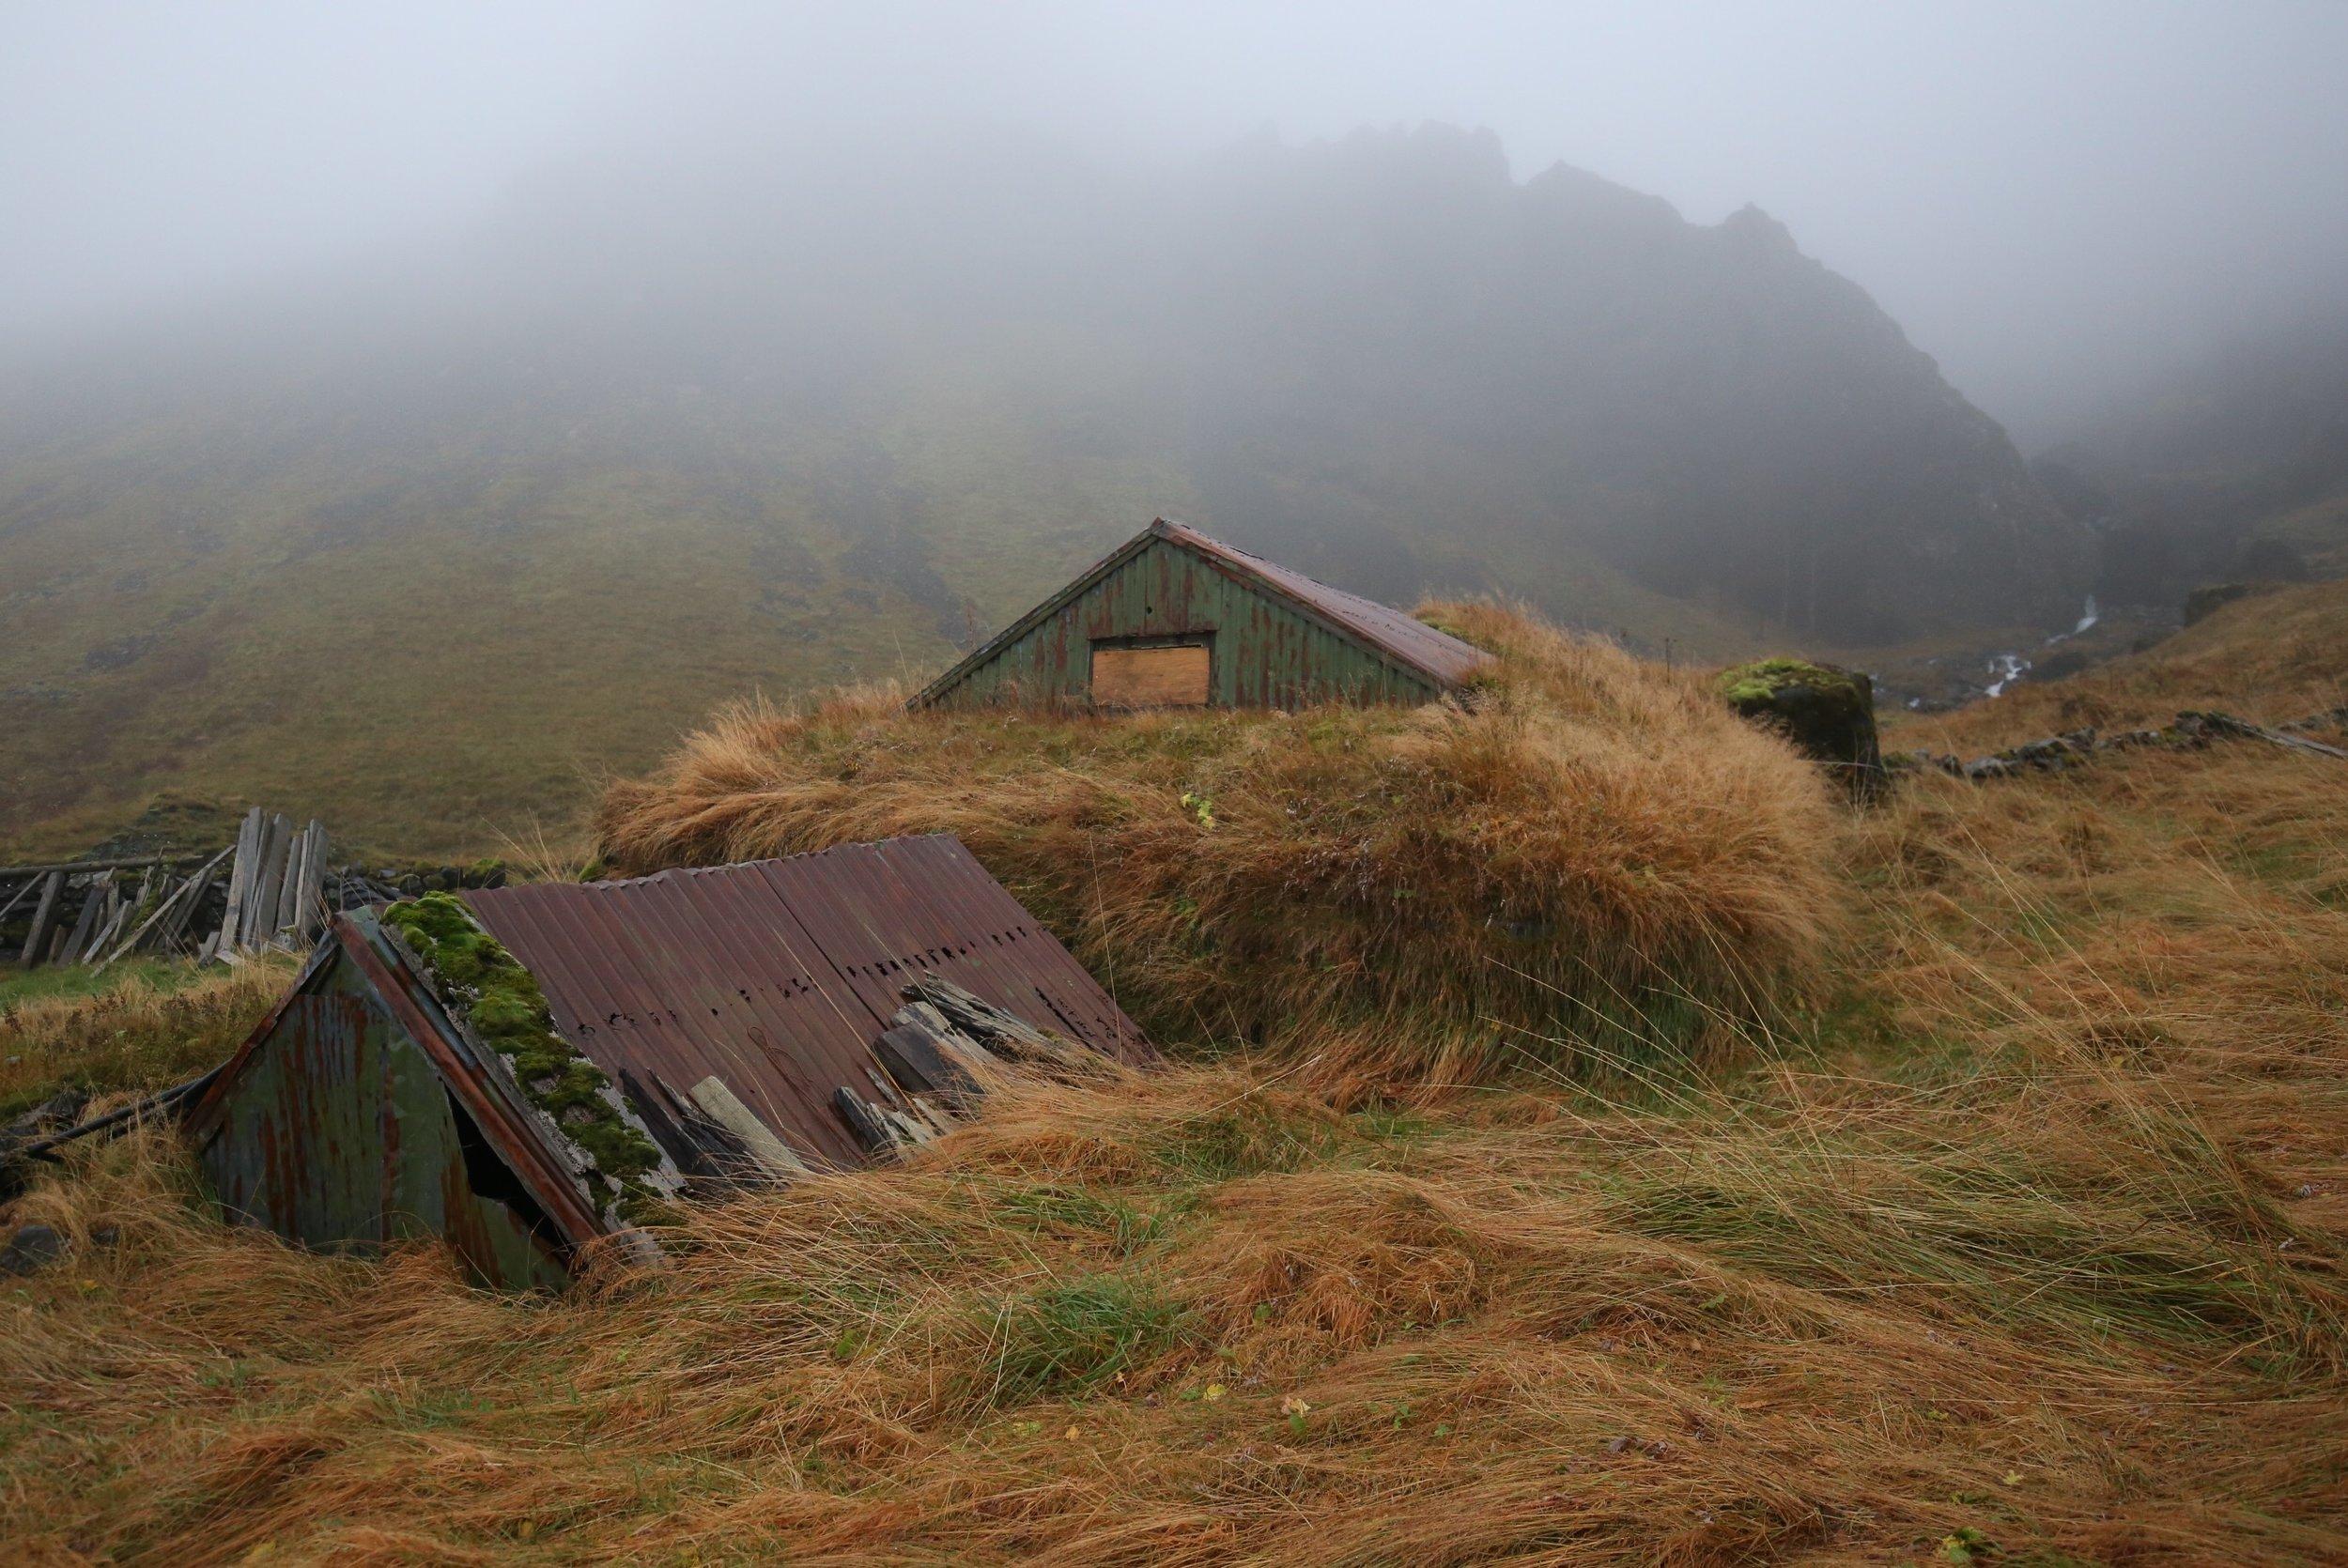 turf village